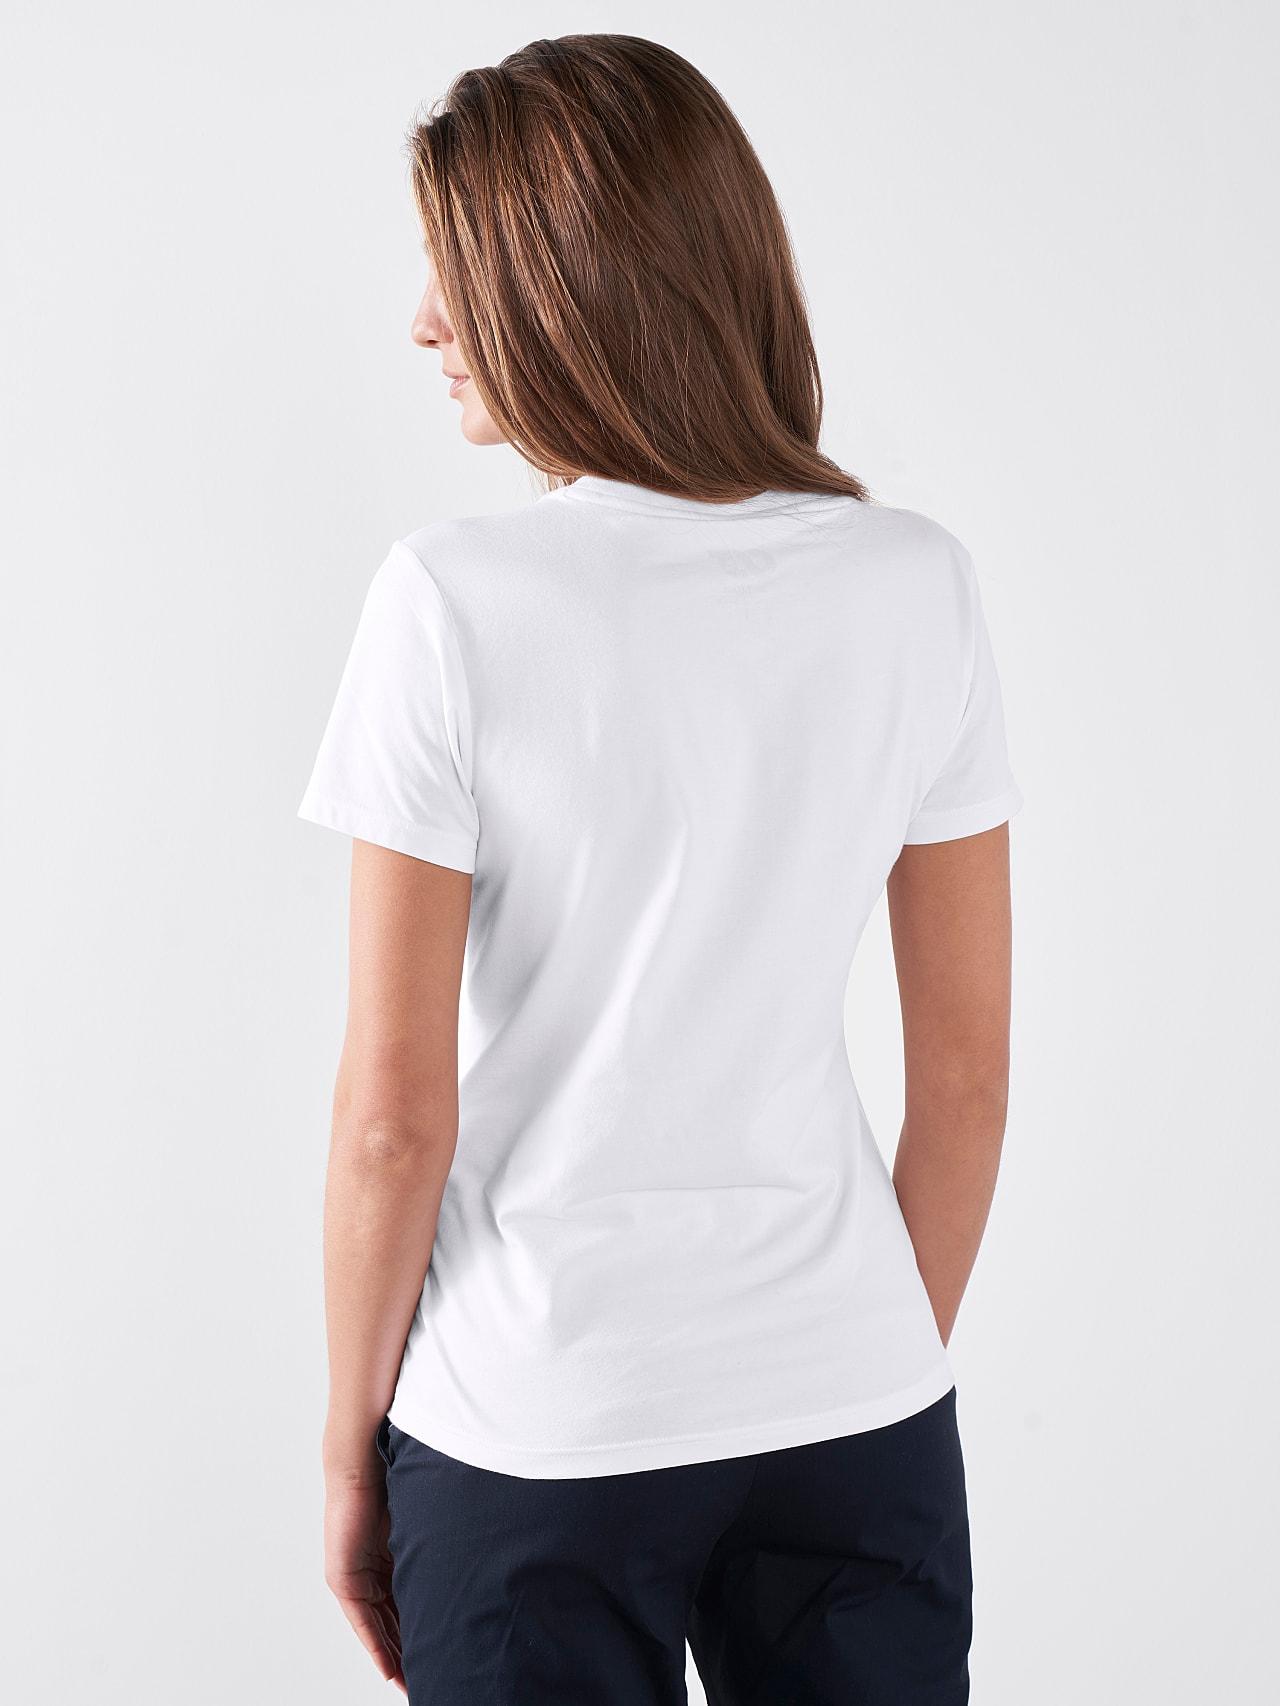 JALP V4.Y5.01 Cotton Logo T-Shirt white Front Main Alpha Tauri